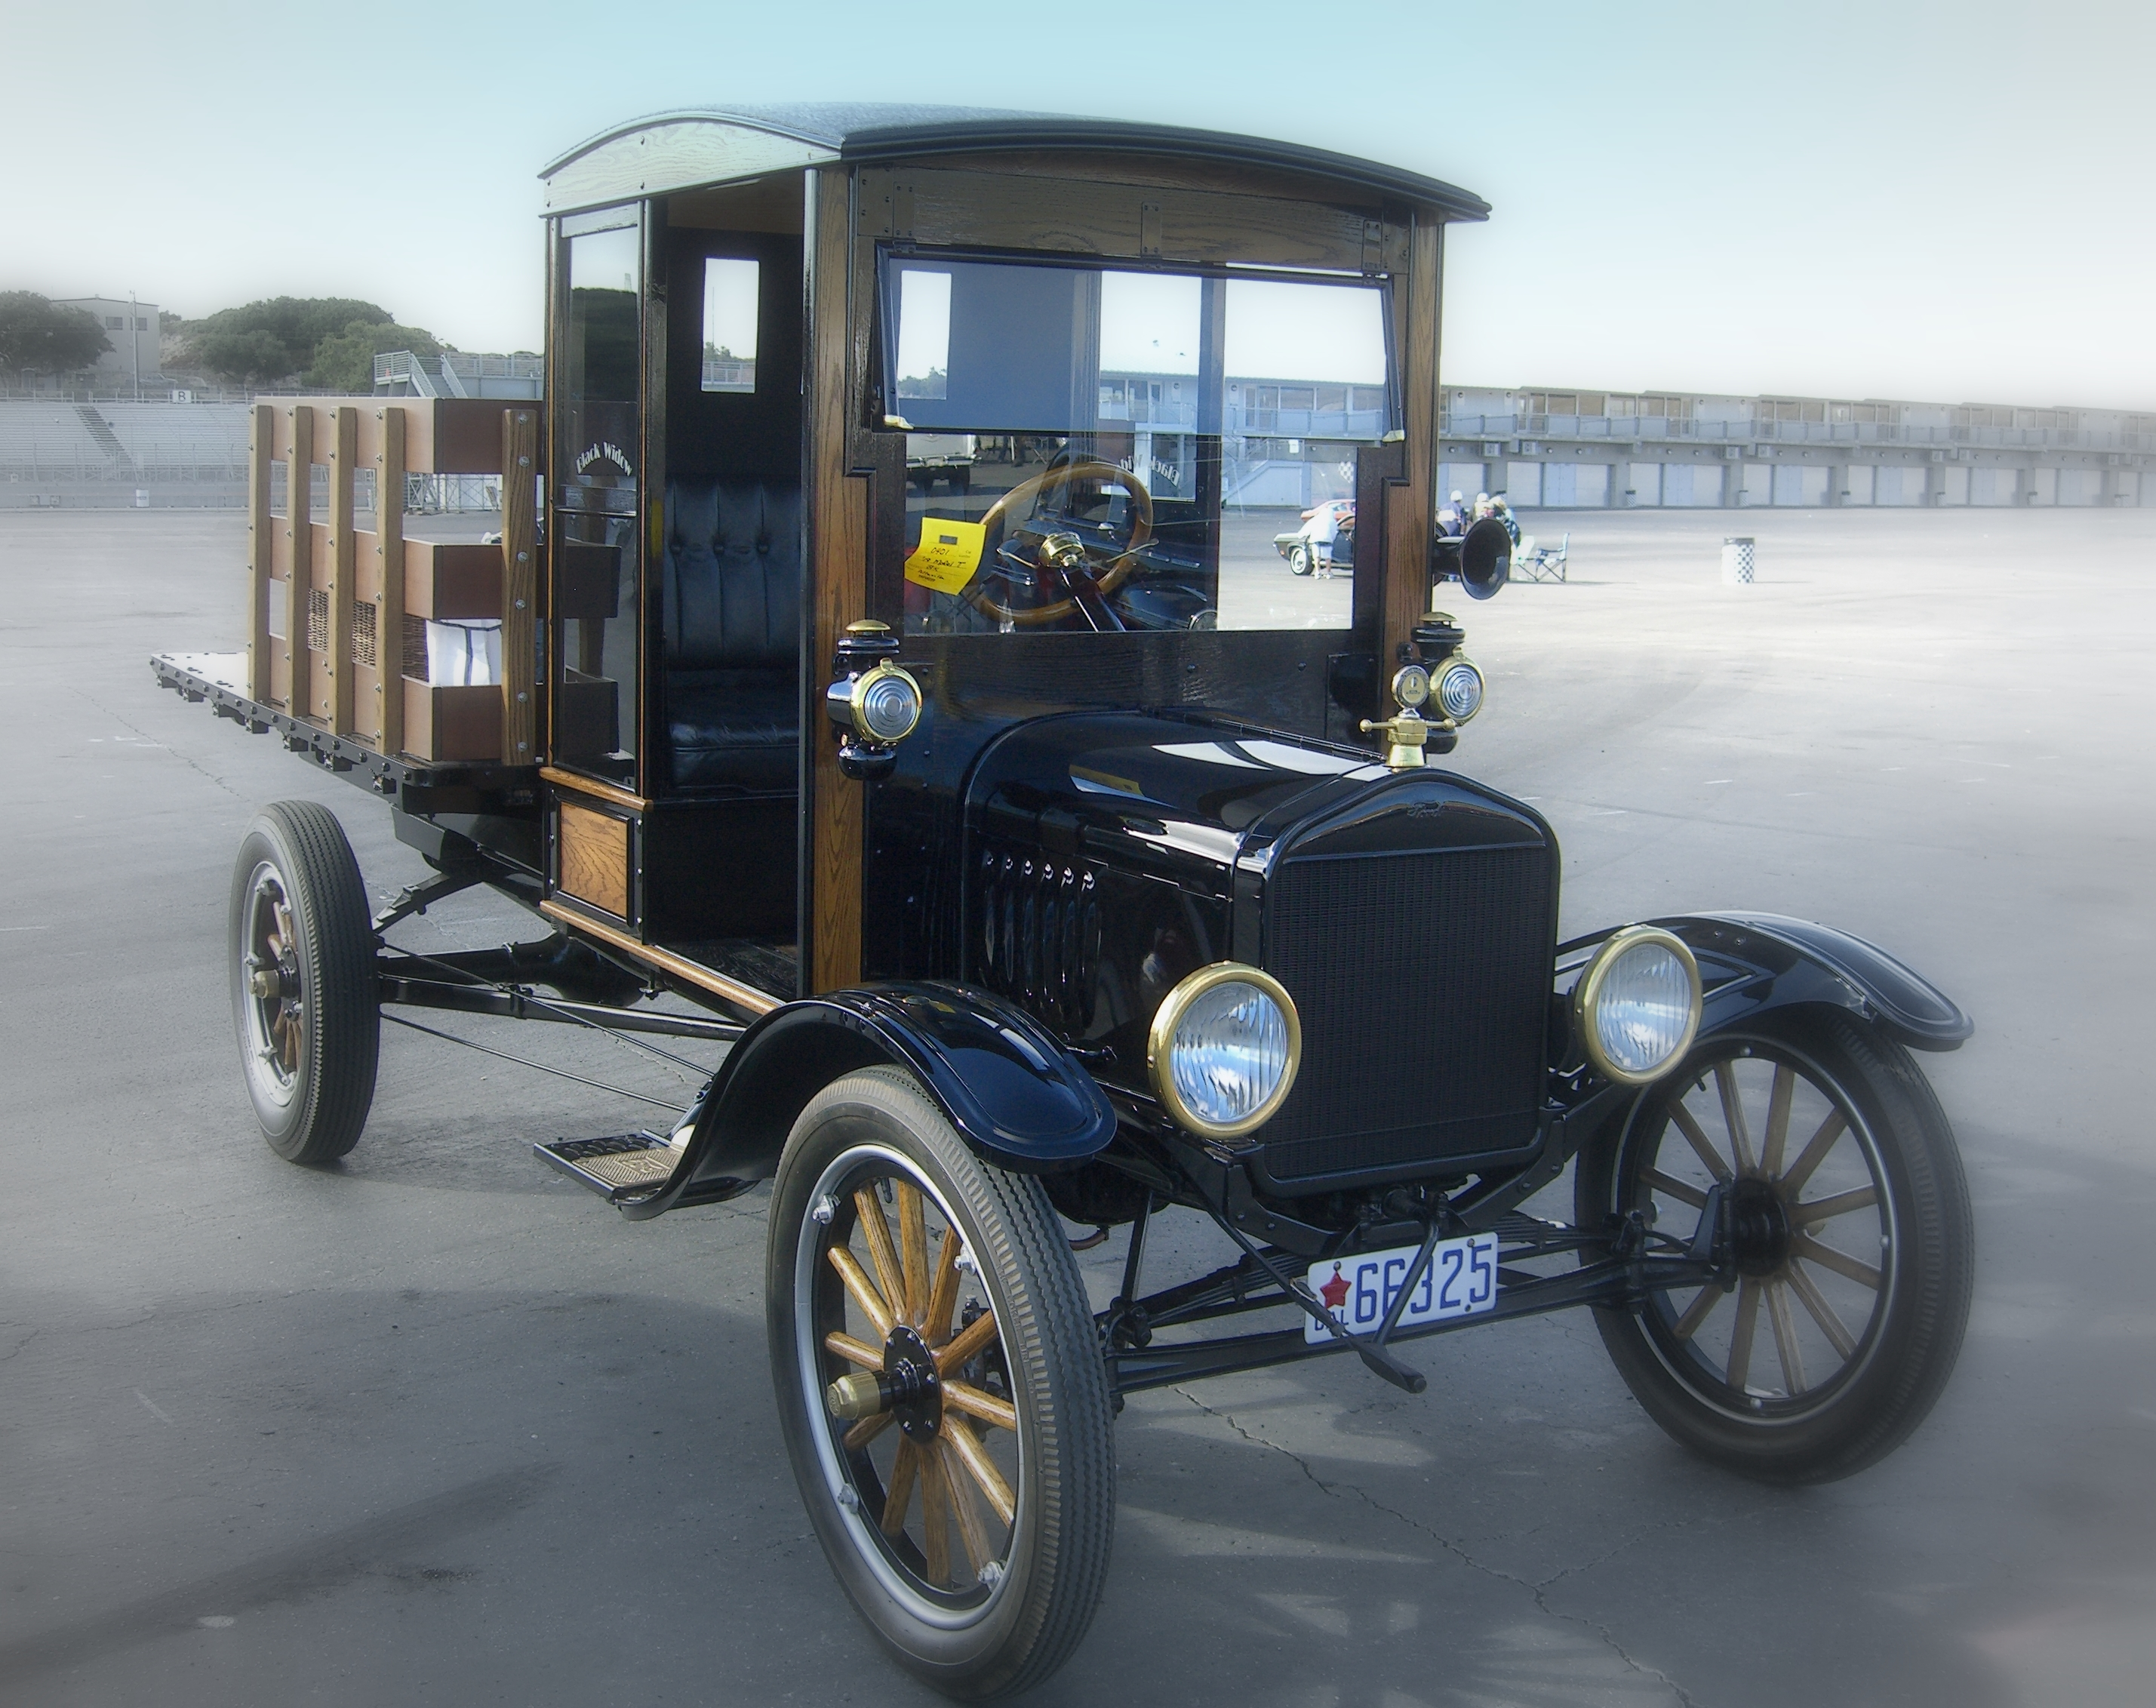 File:1919 Ford Model T Pickup.JPG - Wikimedia Commons